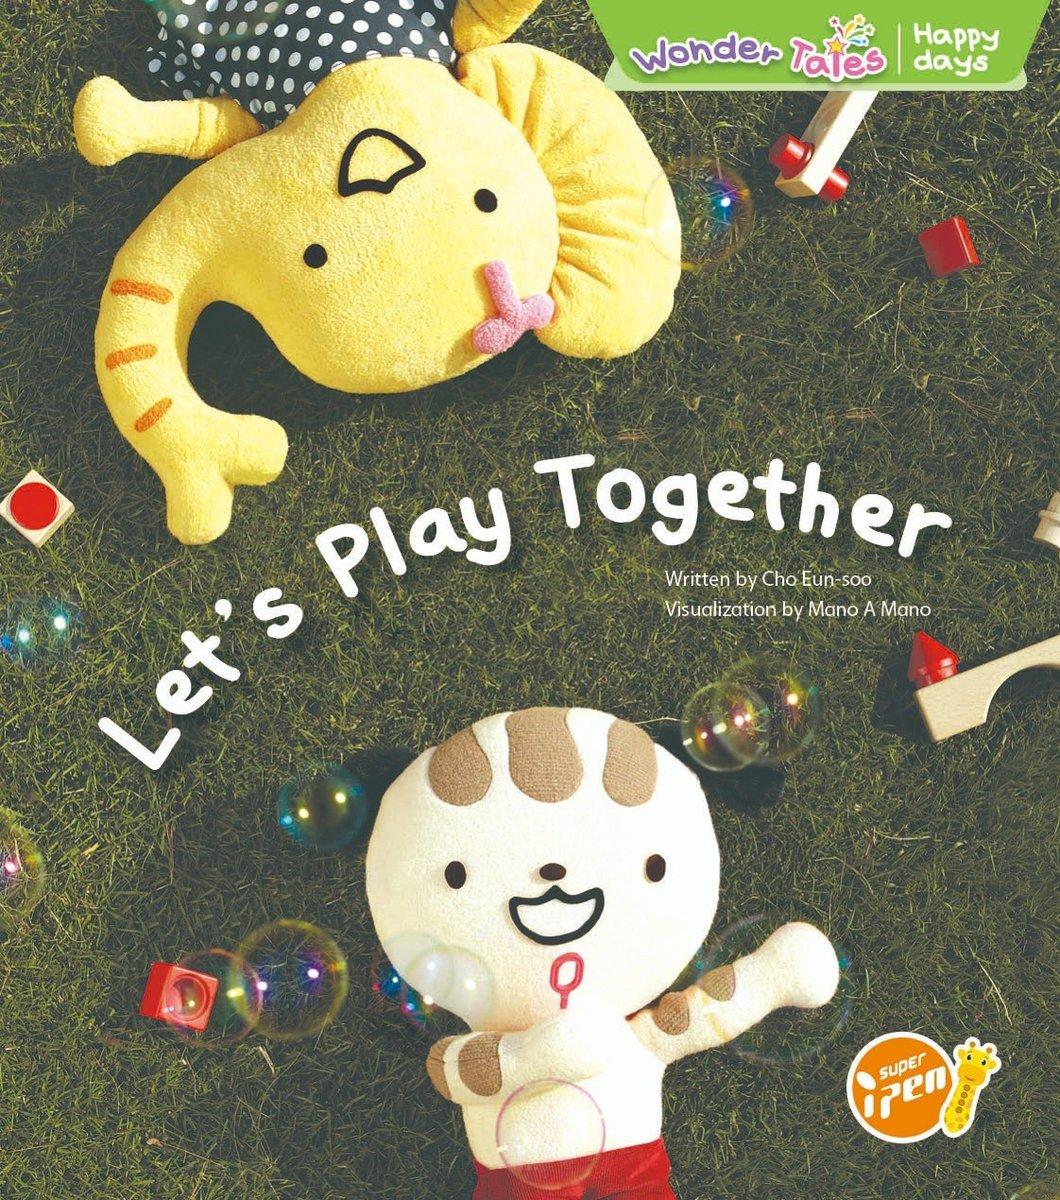 Wonder Tales 英文繪本  (K3)—Let's Play Together